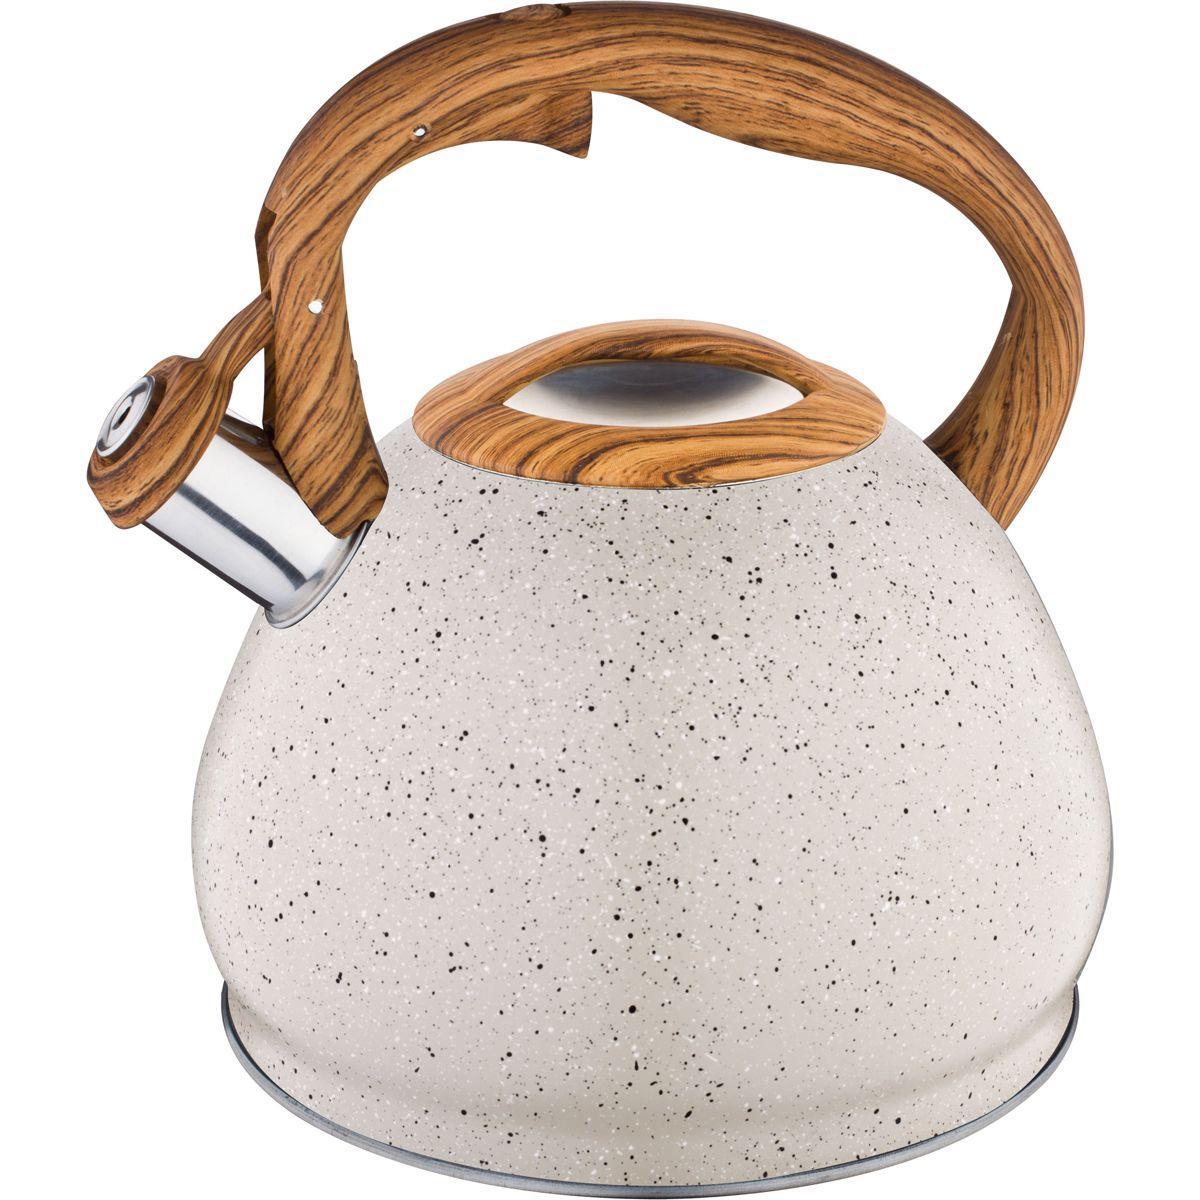 Чайник со свистком Agness термоаккумулирующее дно (3 л)